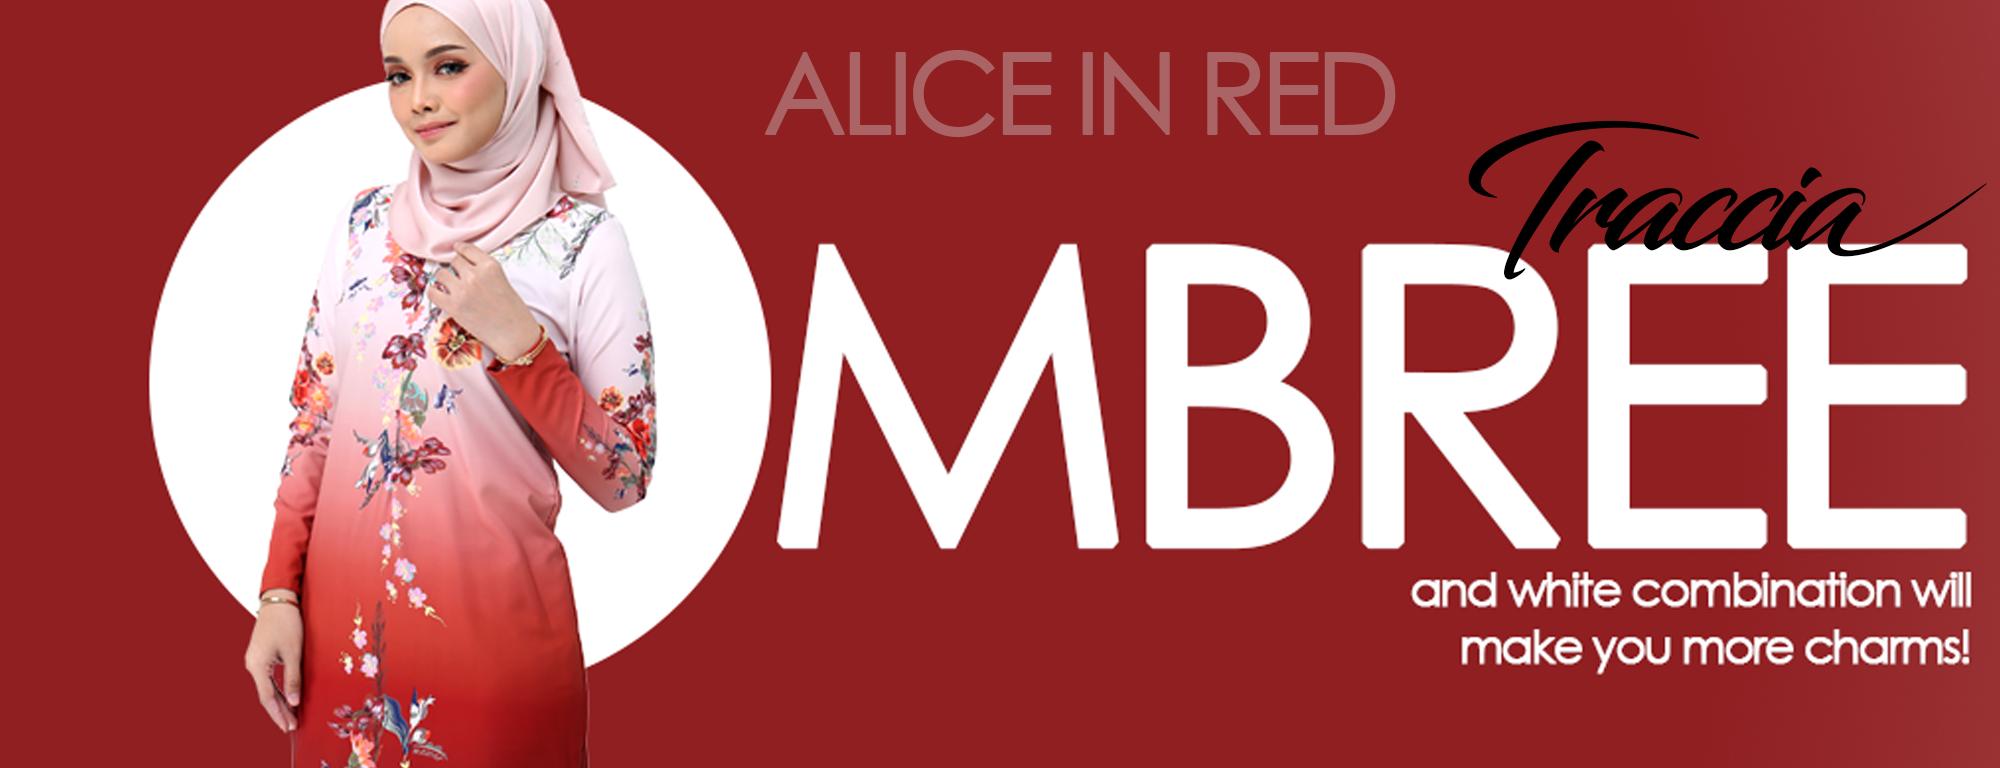 Banner Red White